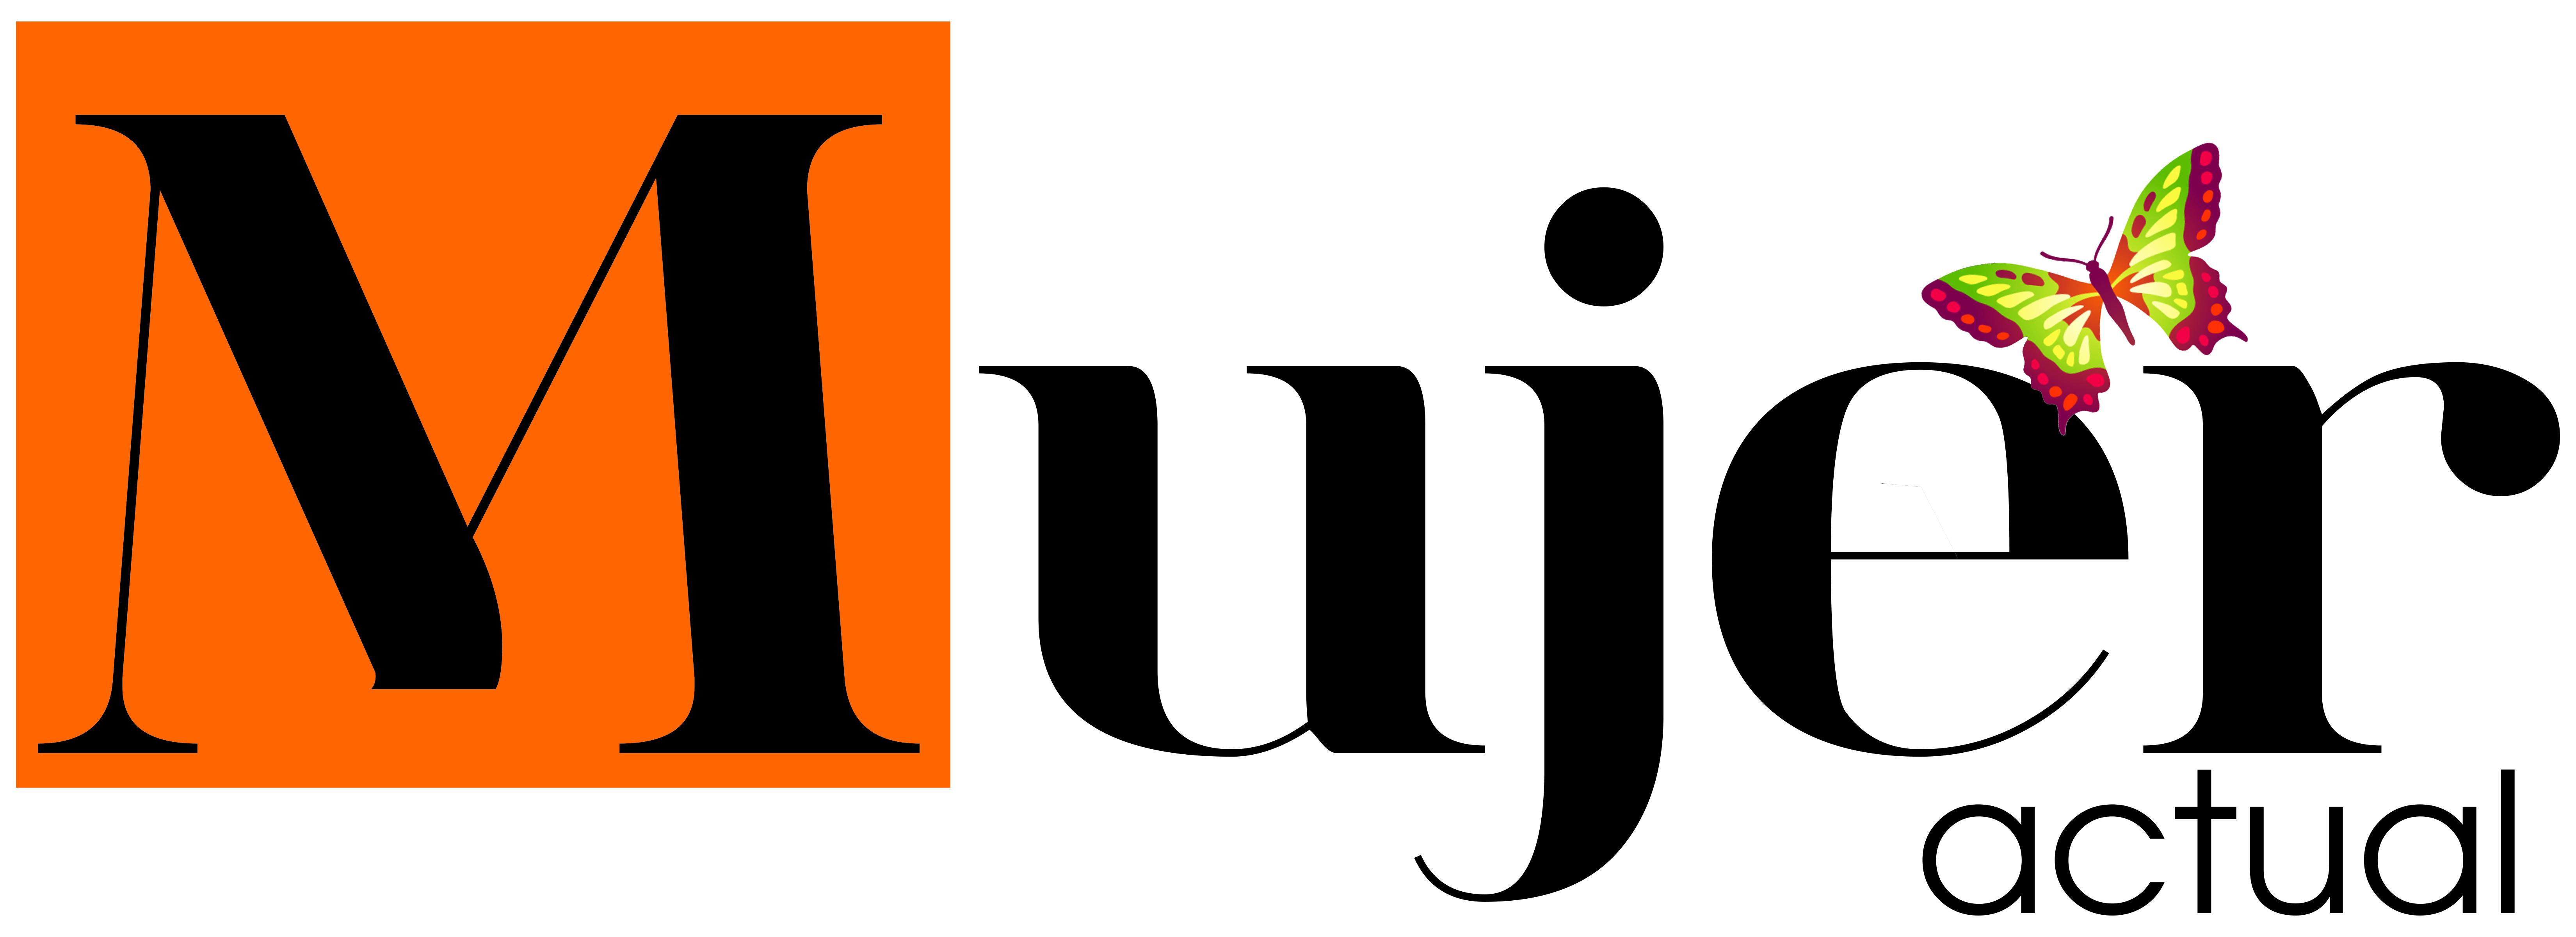 Mujer Actual Logo